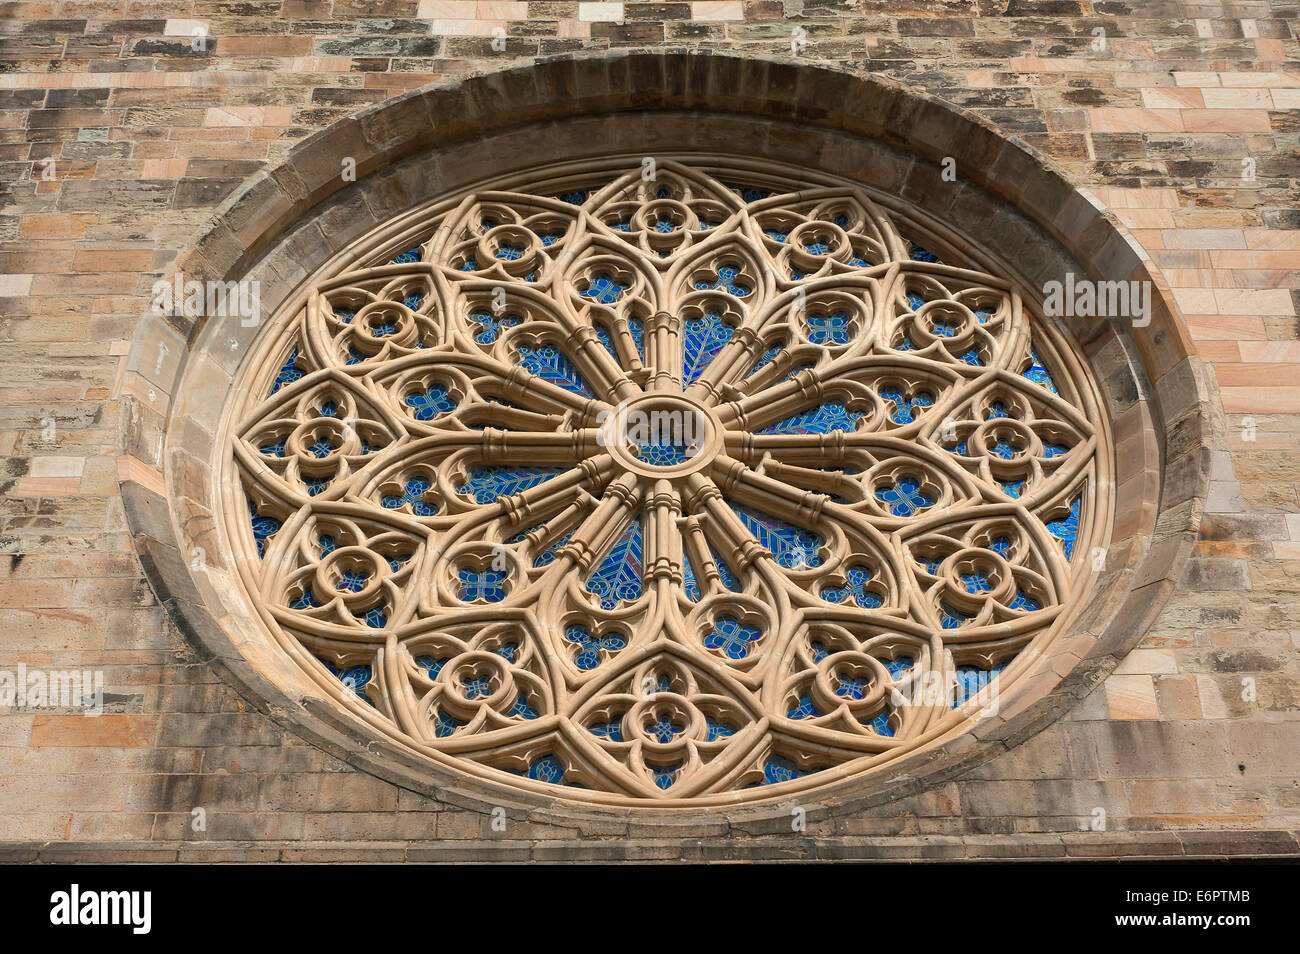 Gothic Rose Window Of The Parish Church St John 14th Century Osnabruck Lower Saxony Germany